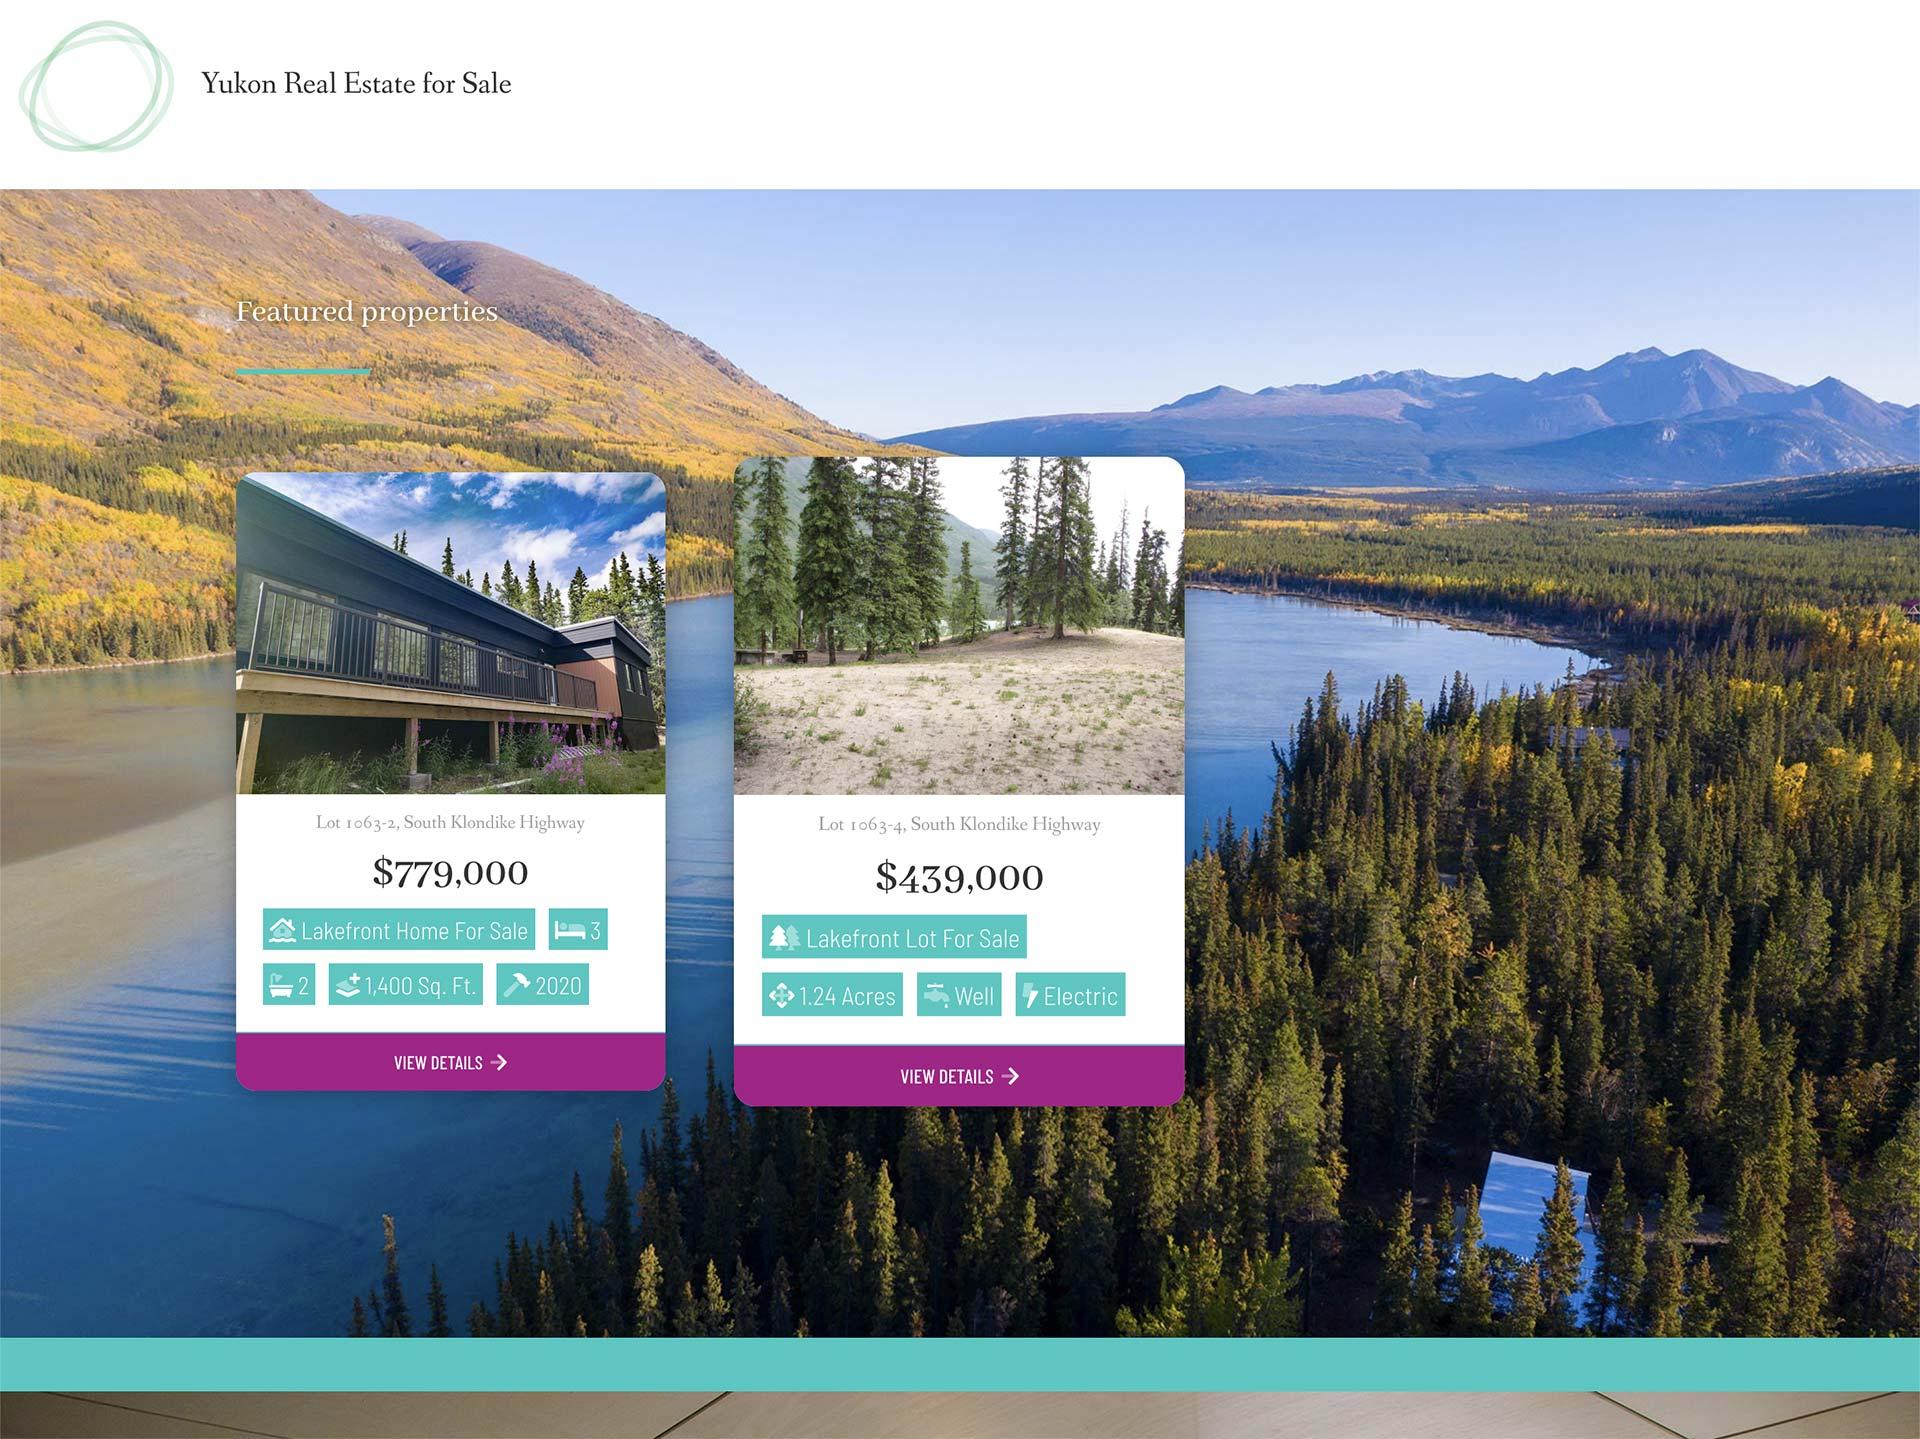 Whitehorse Web Design - A Real Estate web site customer